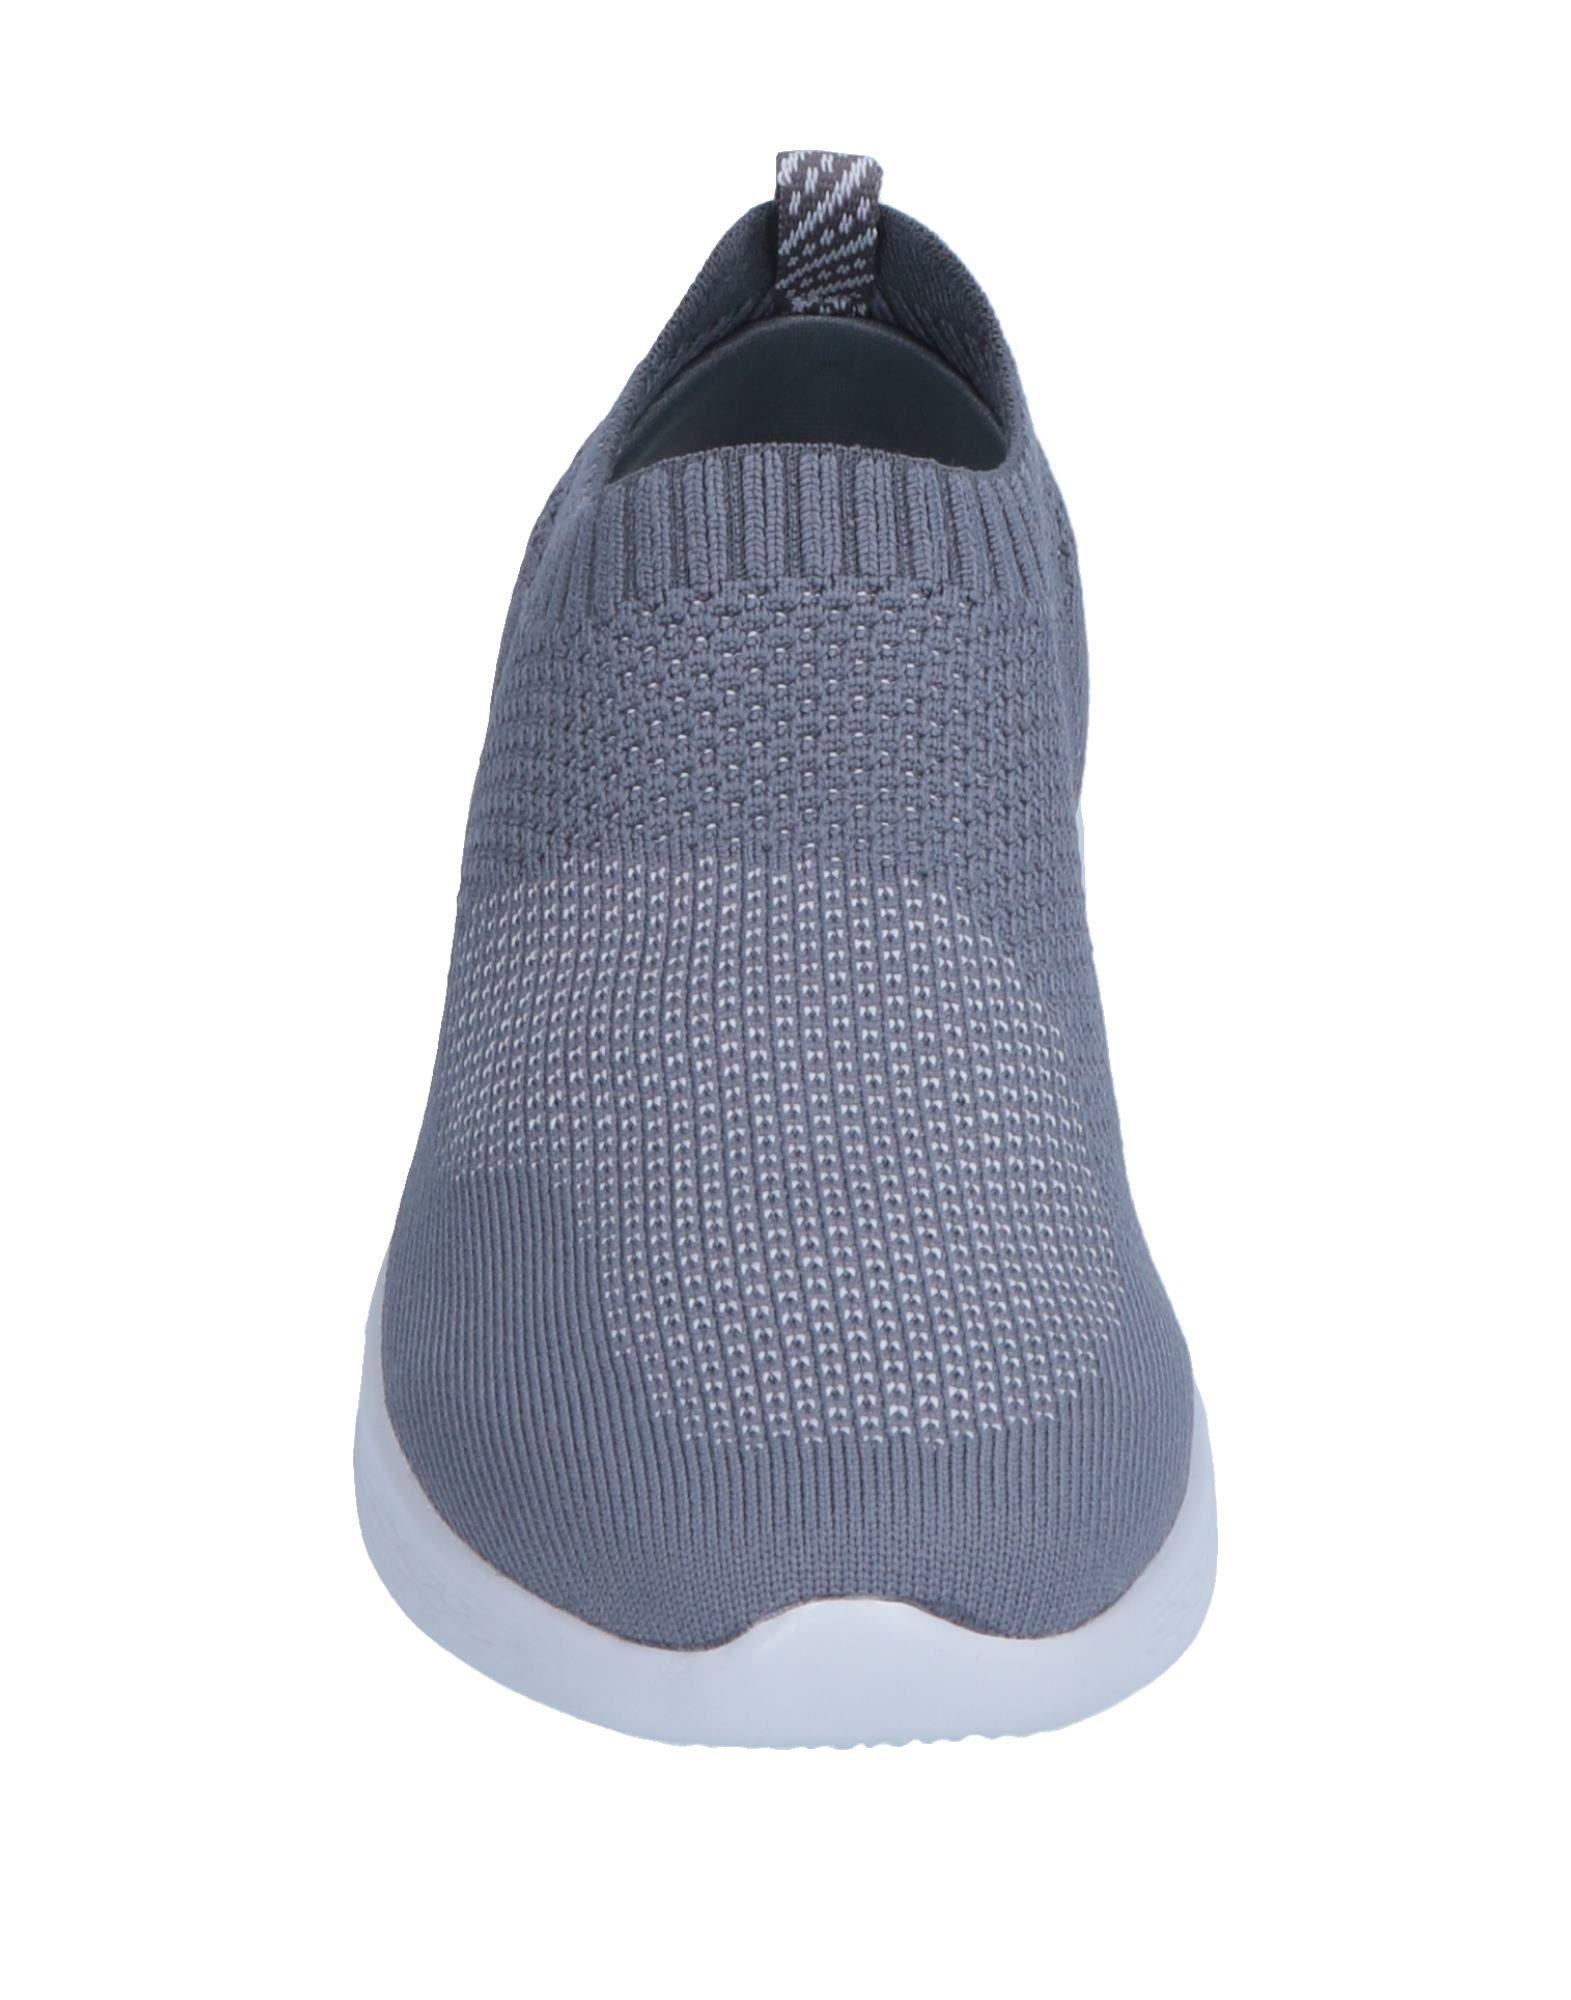 Skechers Sneakers Damen  beliebte 11557474PC Gute Qualität beliebte  Schuhe 5482b9